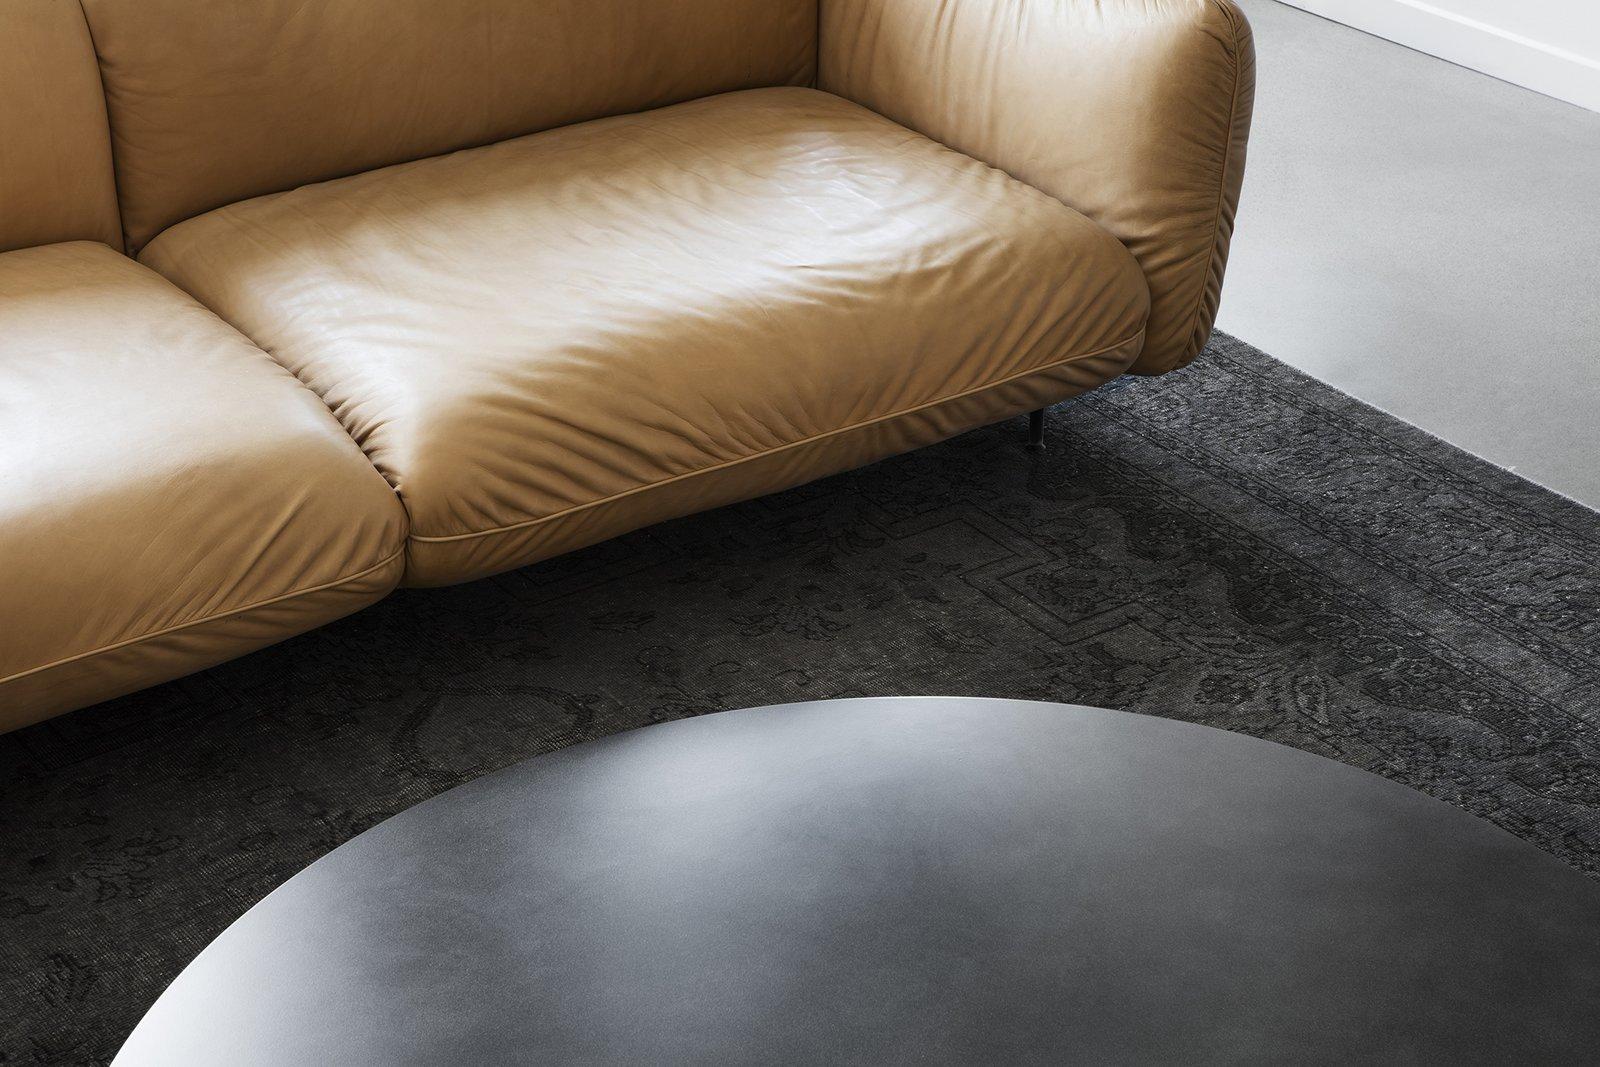 Living Room, Sofa, Coffee Tables, Concrete Floor, and Rug Floor  Saint-Laurent Apartment by Atelier Barda